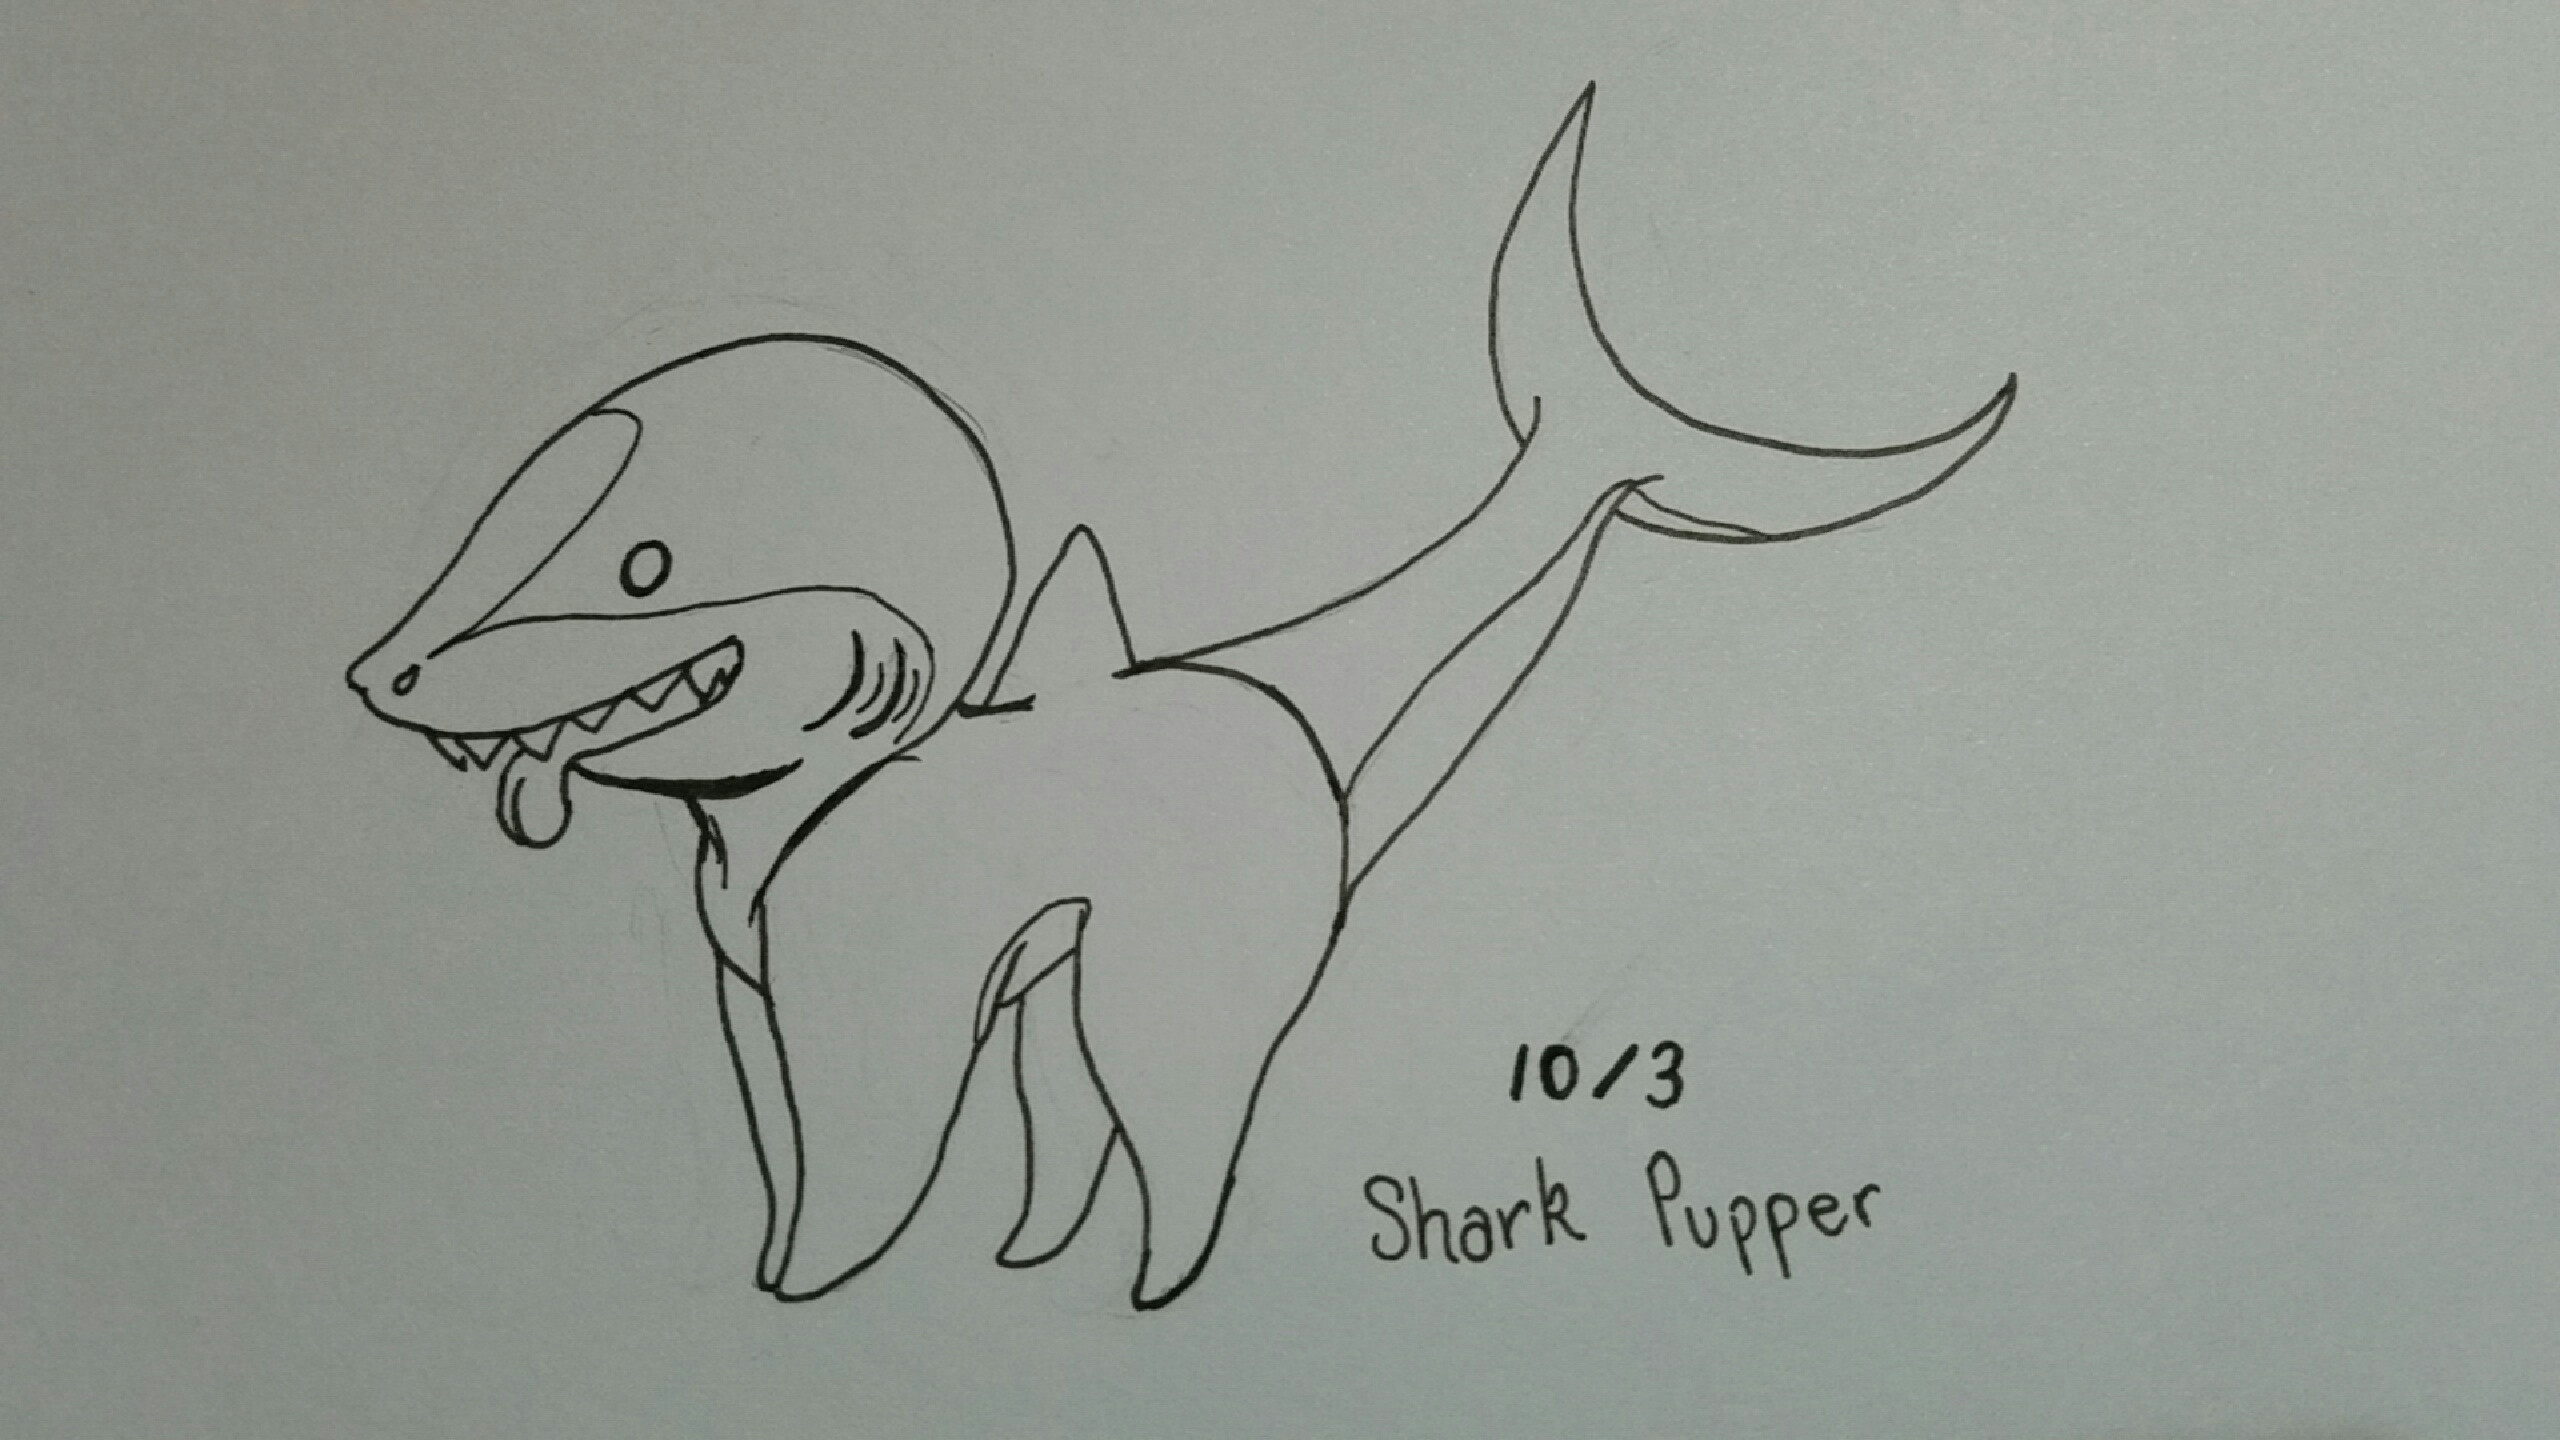 Drawn shark 3rd Late But doing my pupper